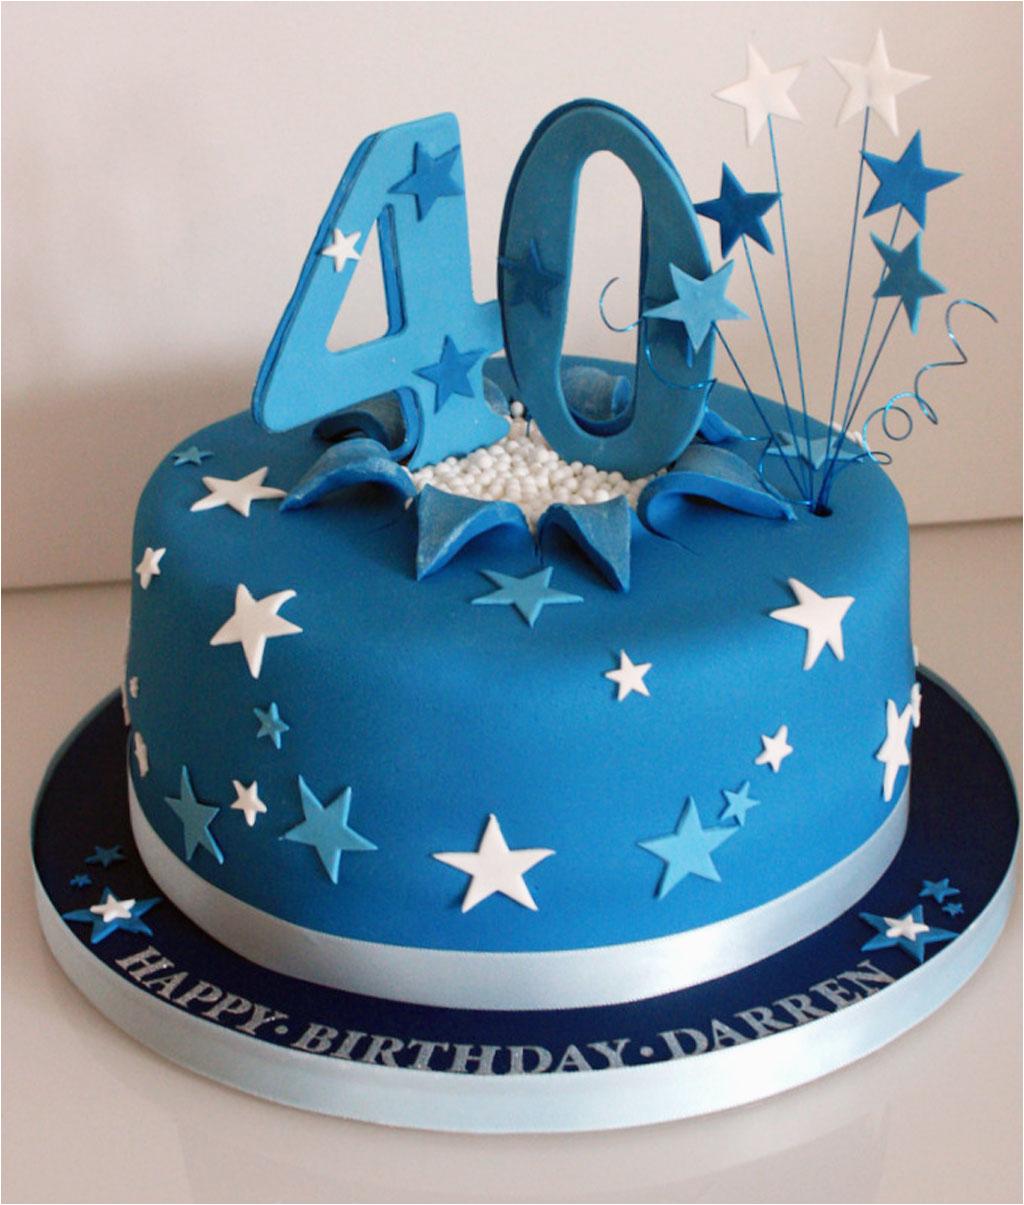 40 Birthday Cake Decorations 40th Birthday Cake Ideas Funny Birthday Cake Cake Ideas